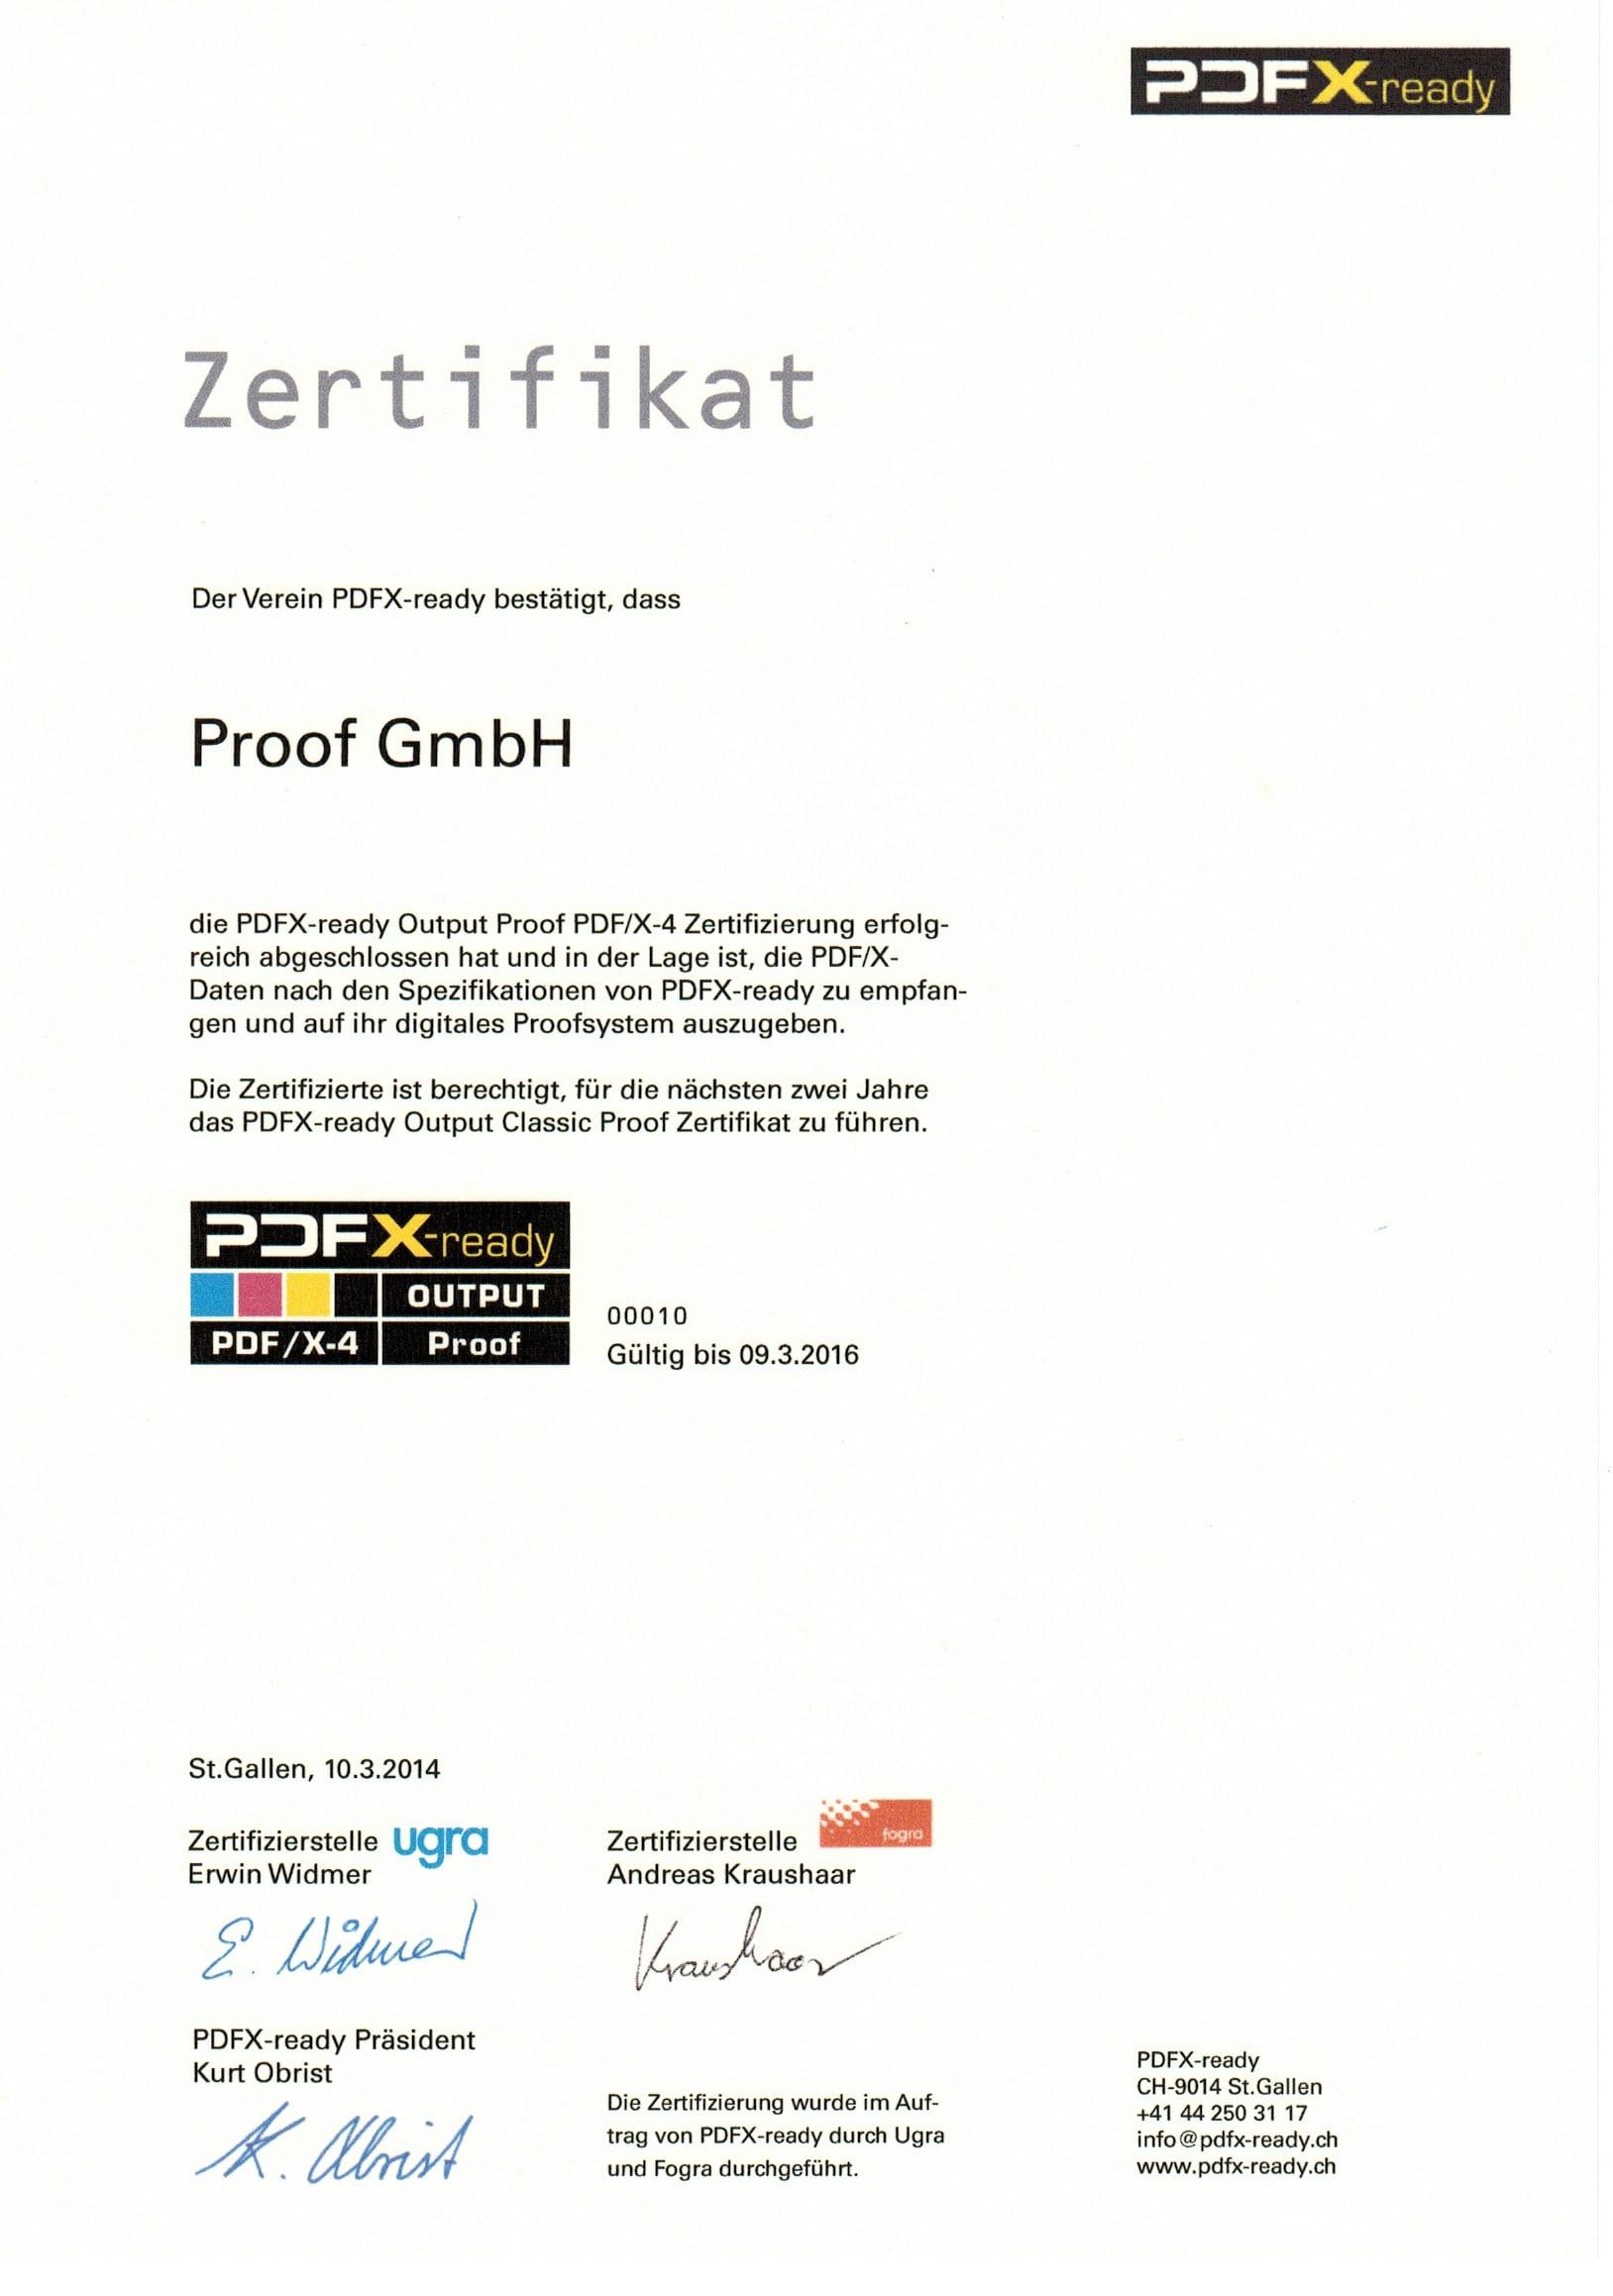 PDFX-ready Output Proof Zertifikat der Proof GmbH für PDF/X-4